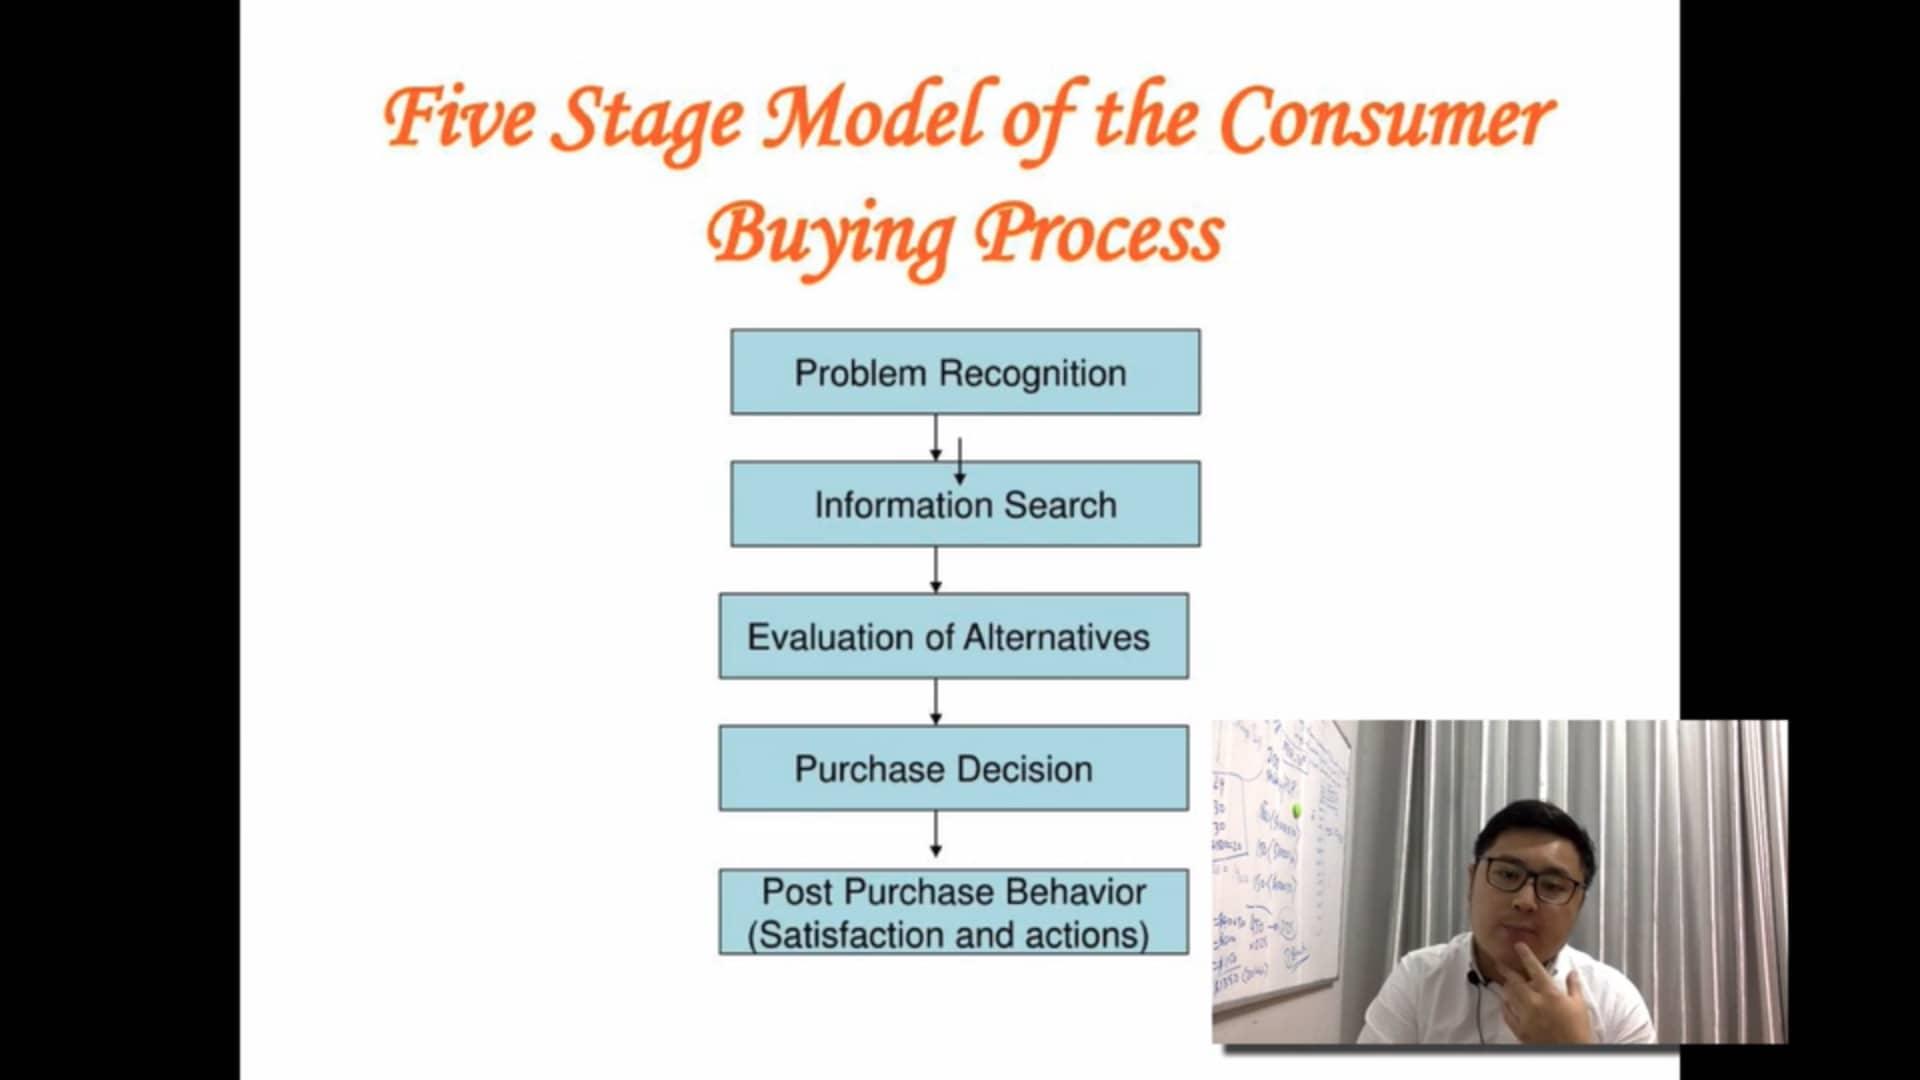 Consumer Buying Process coc marketing 6